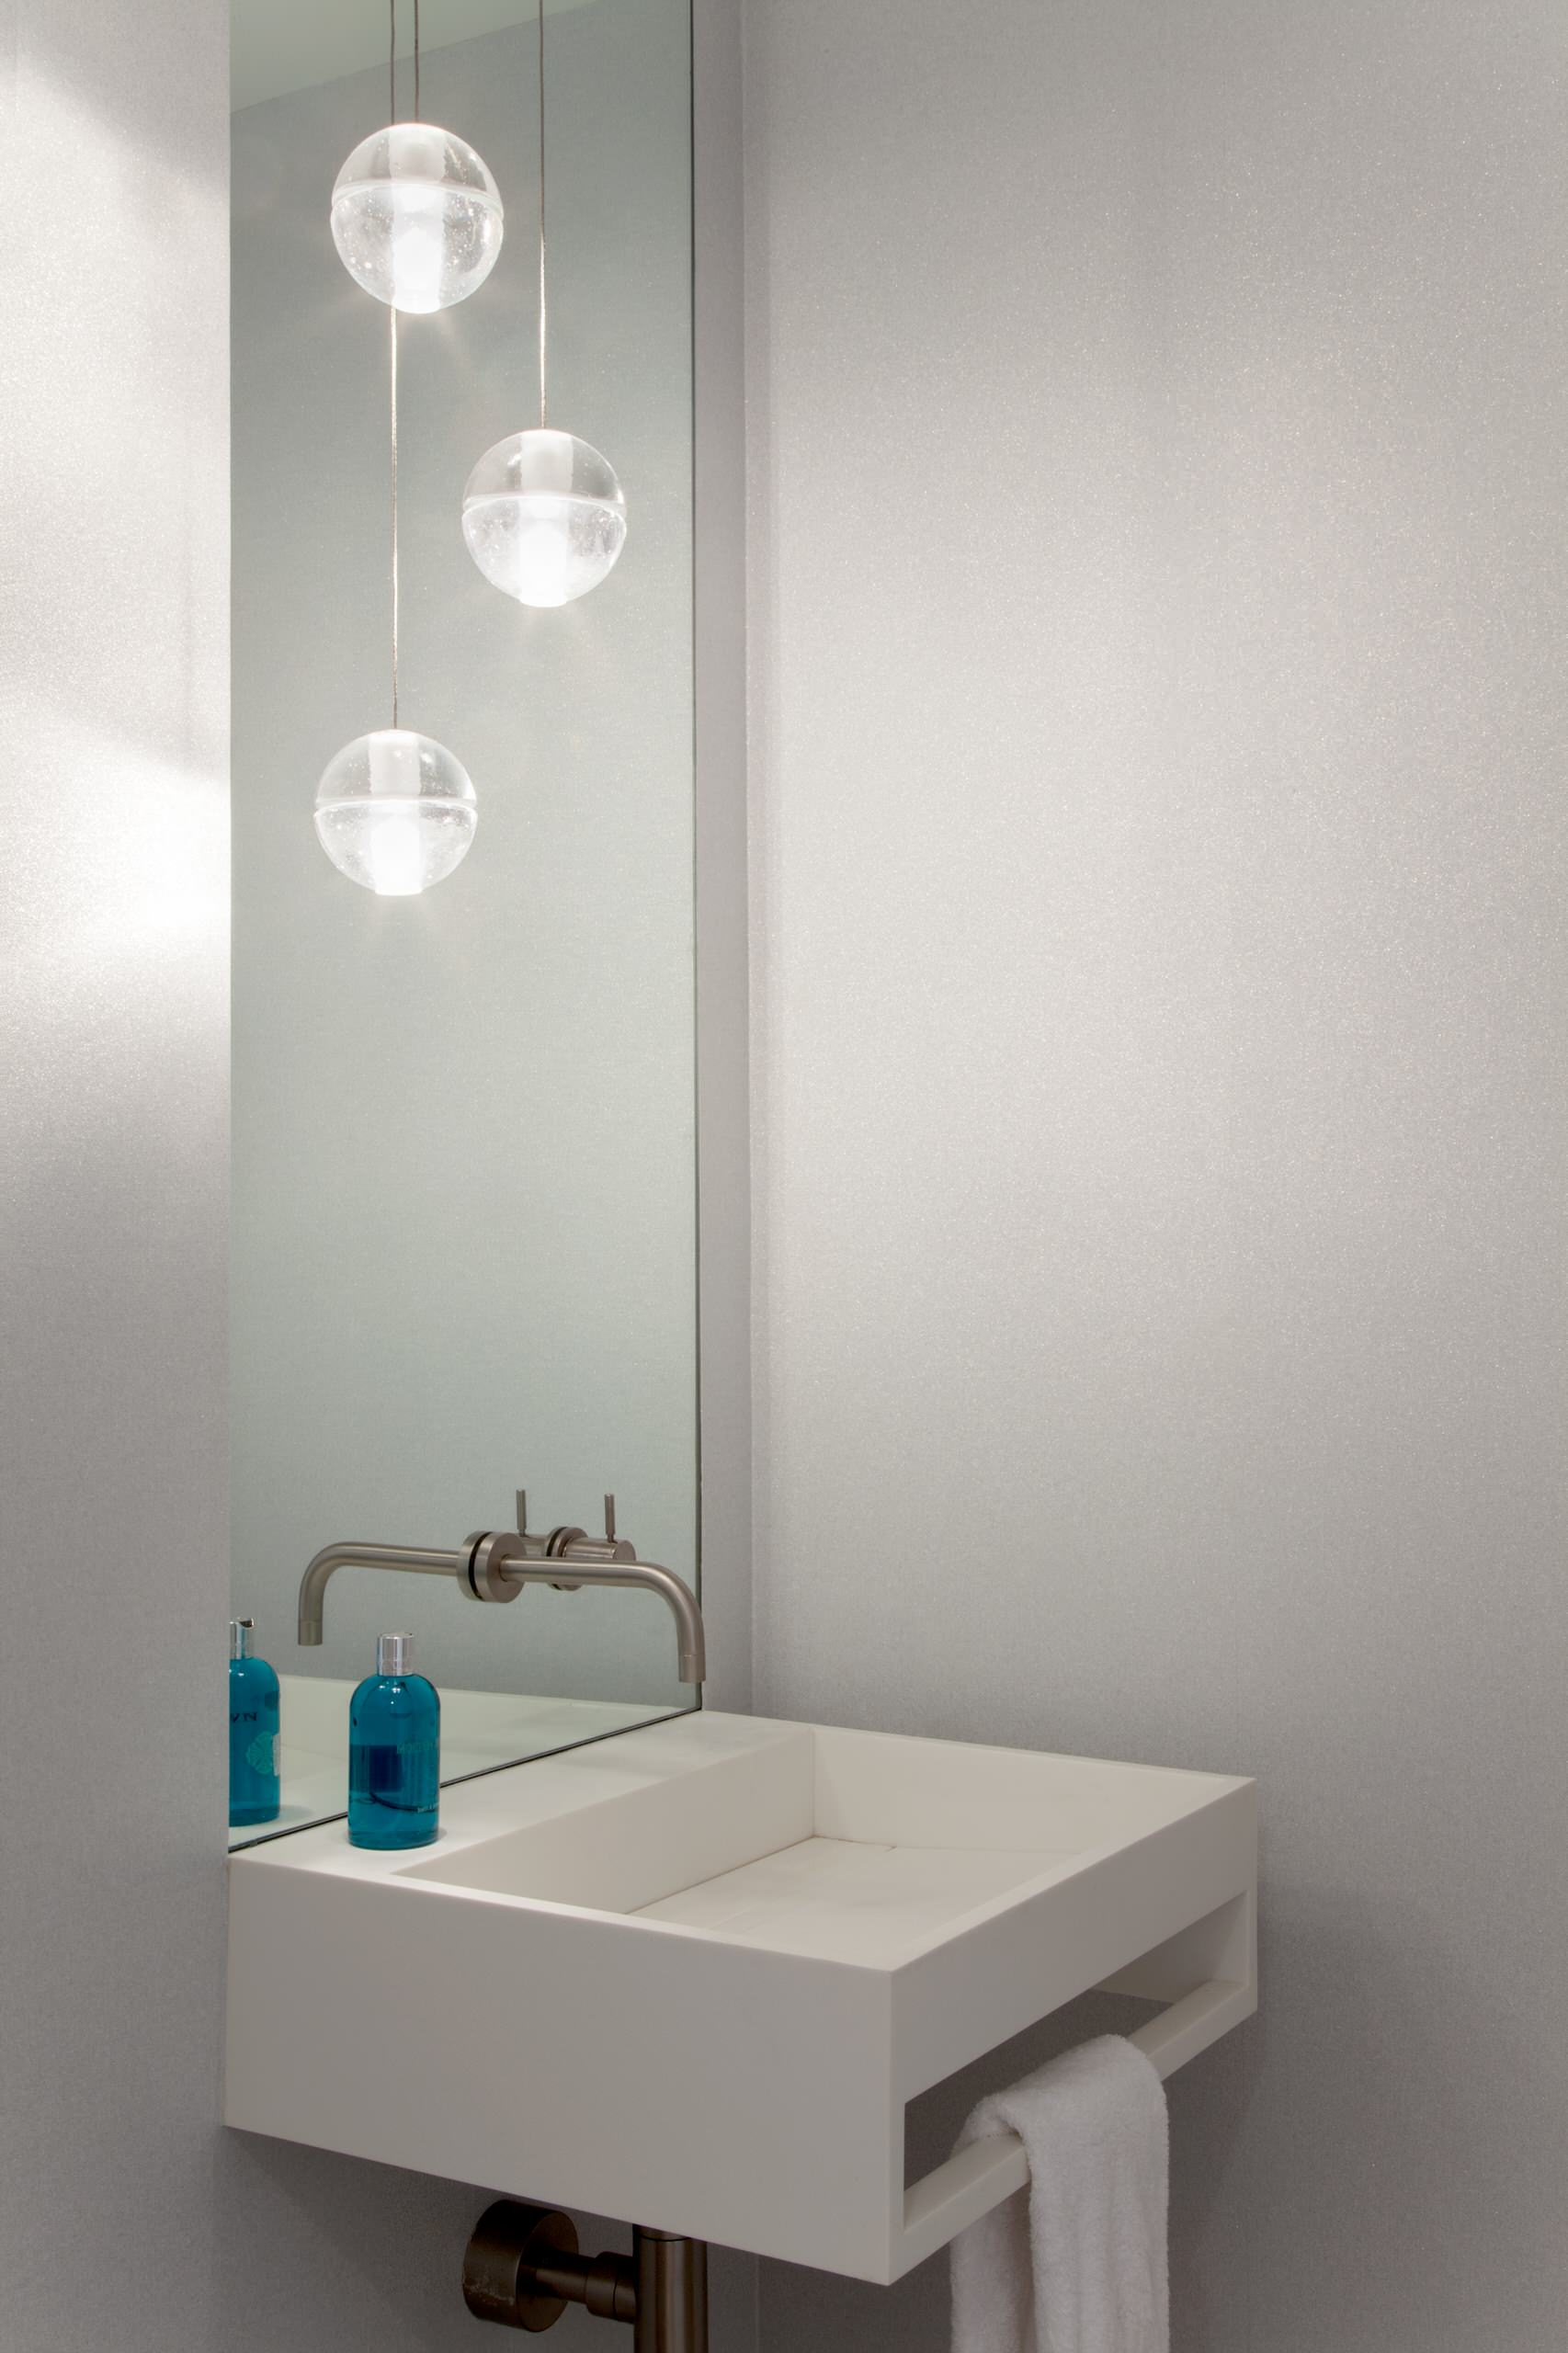 unique bathroom faucets elc